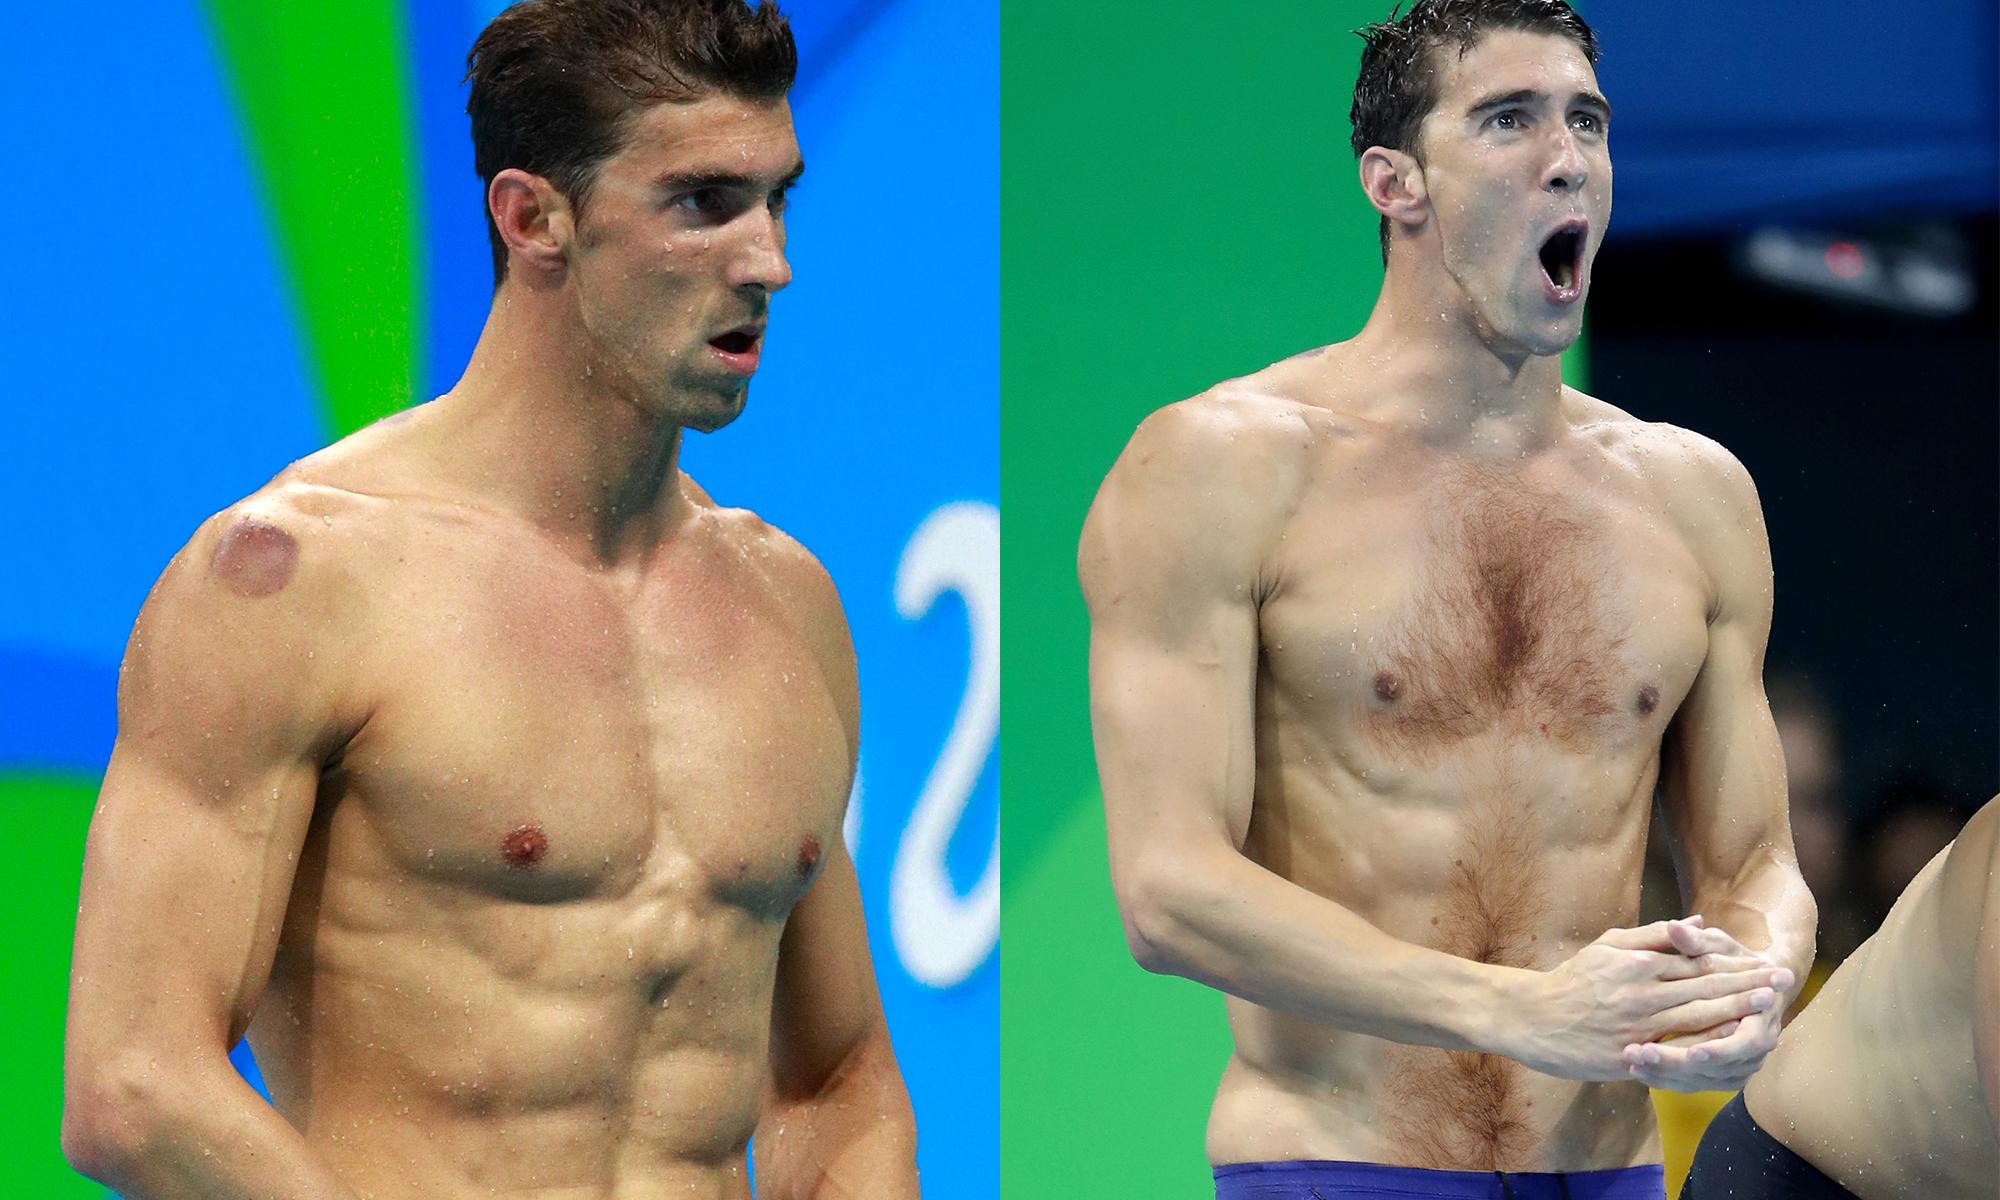 Celeb Naked Photos Of Michael Phelps Pic